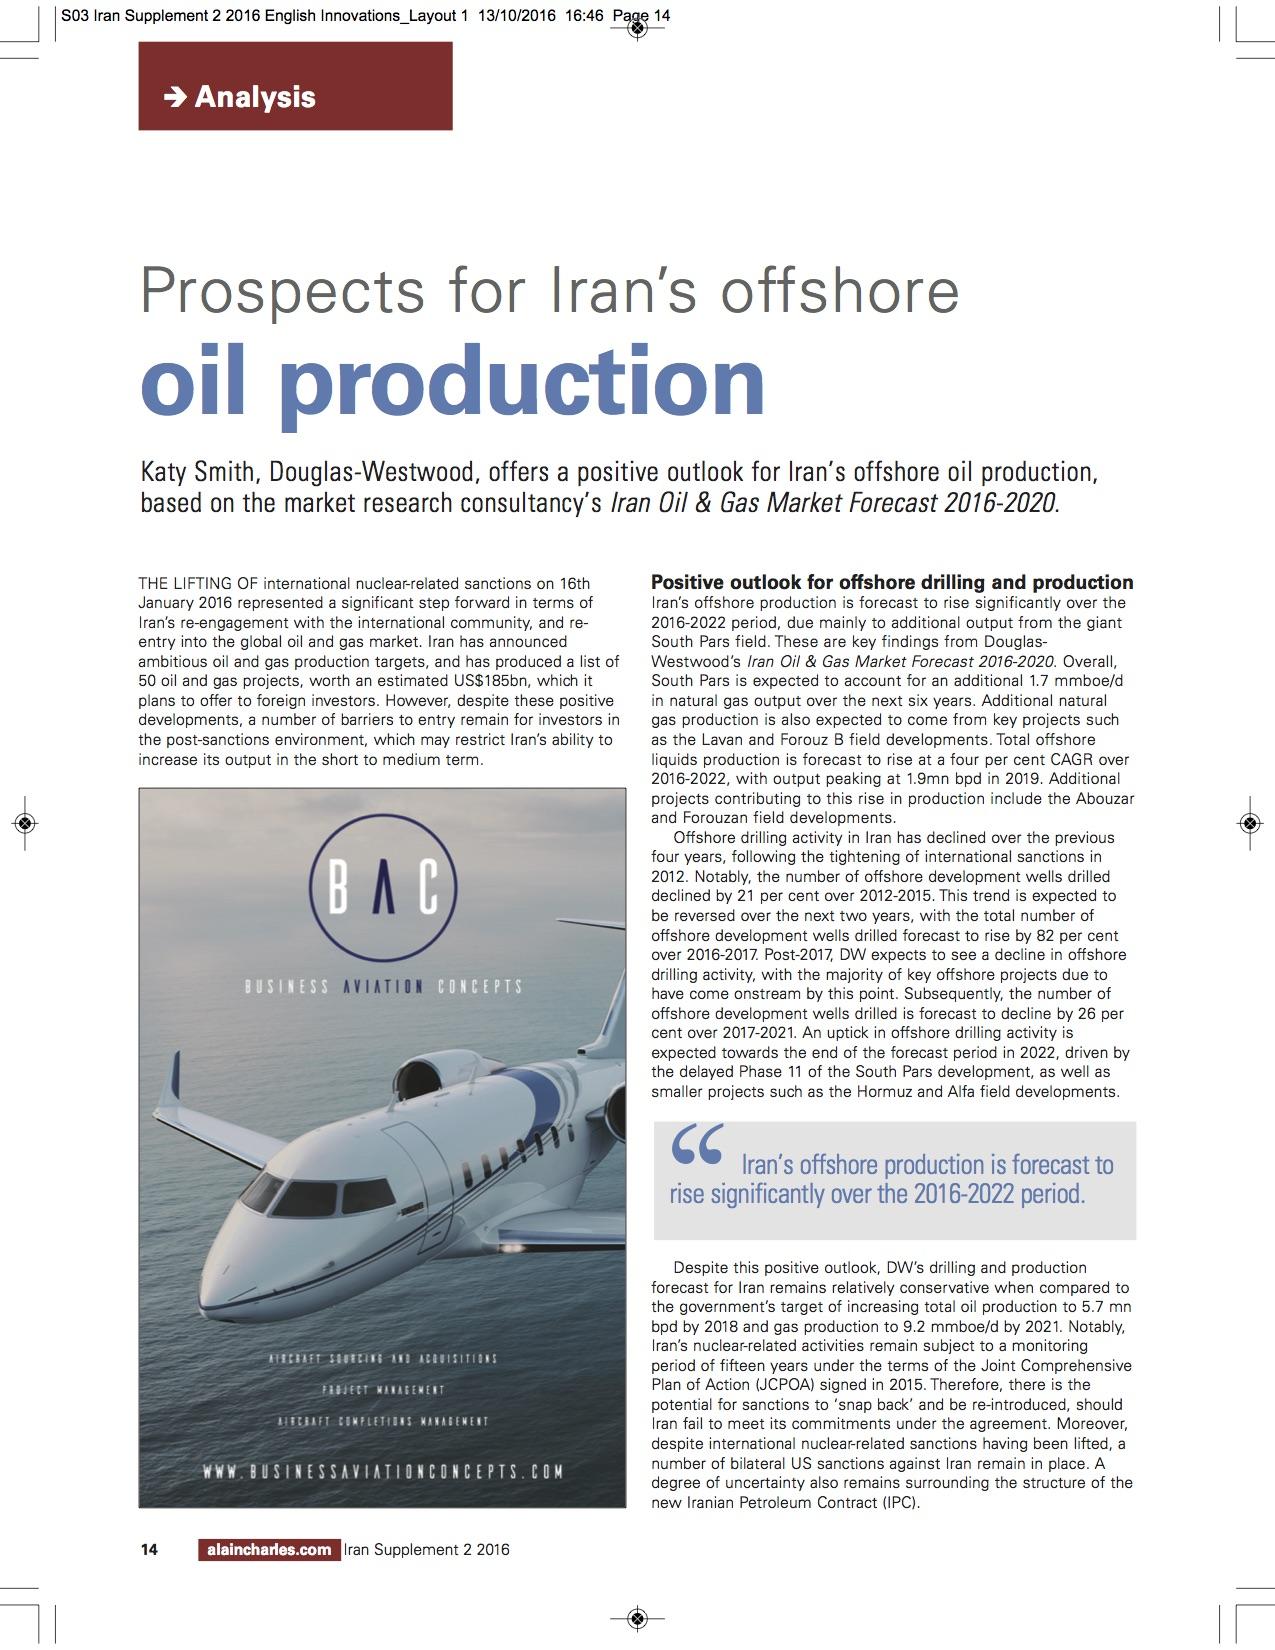 Iran Supplement 2 2016 pg 14.jpg